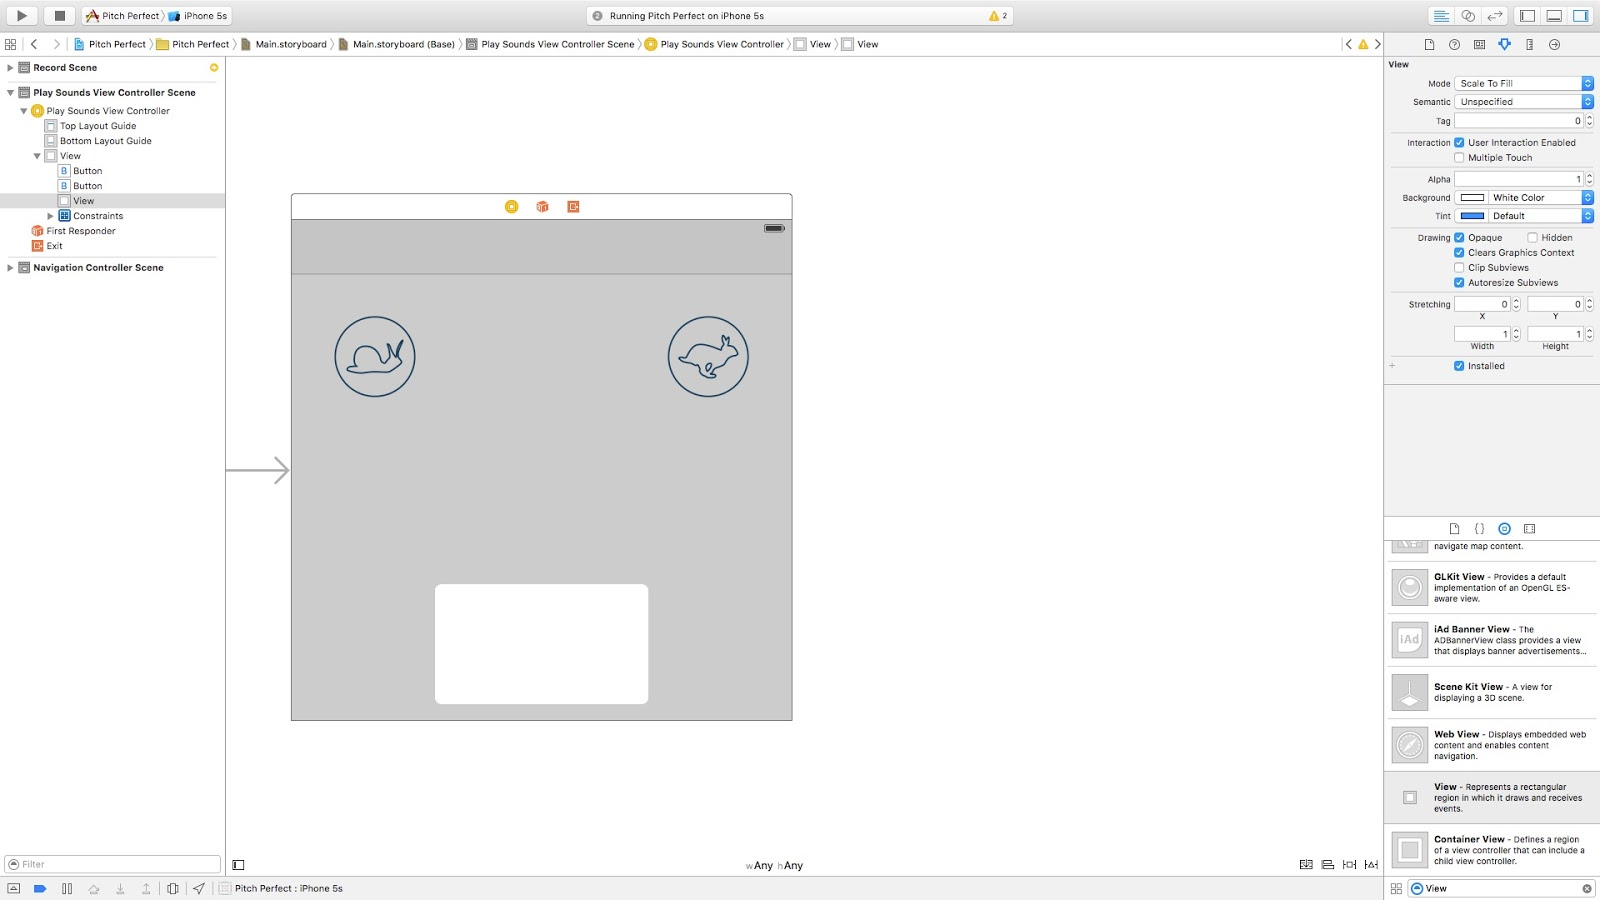 iOS Custom Views : How do you add a play/pause bar in Swift? | iOS